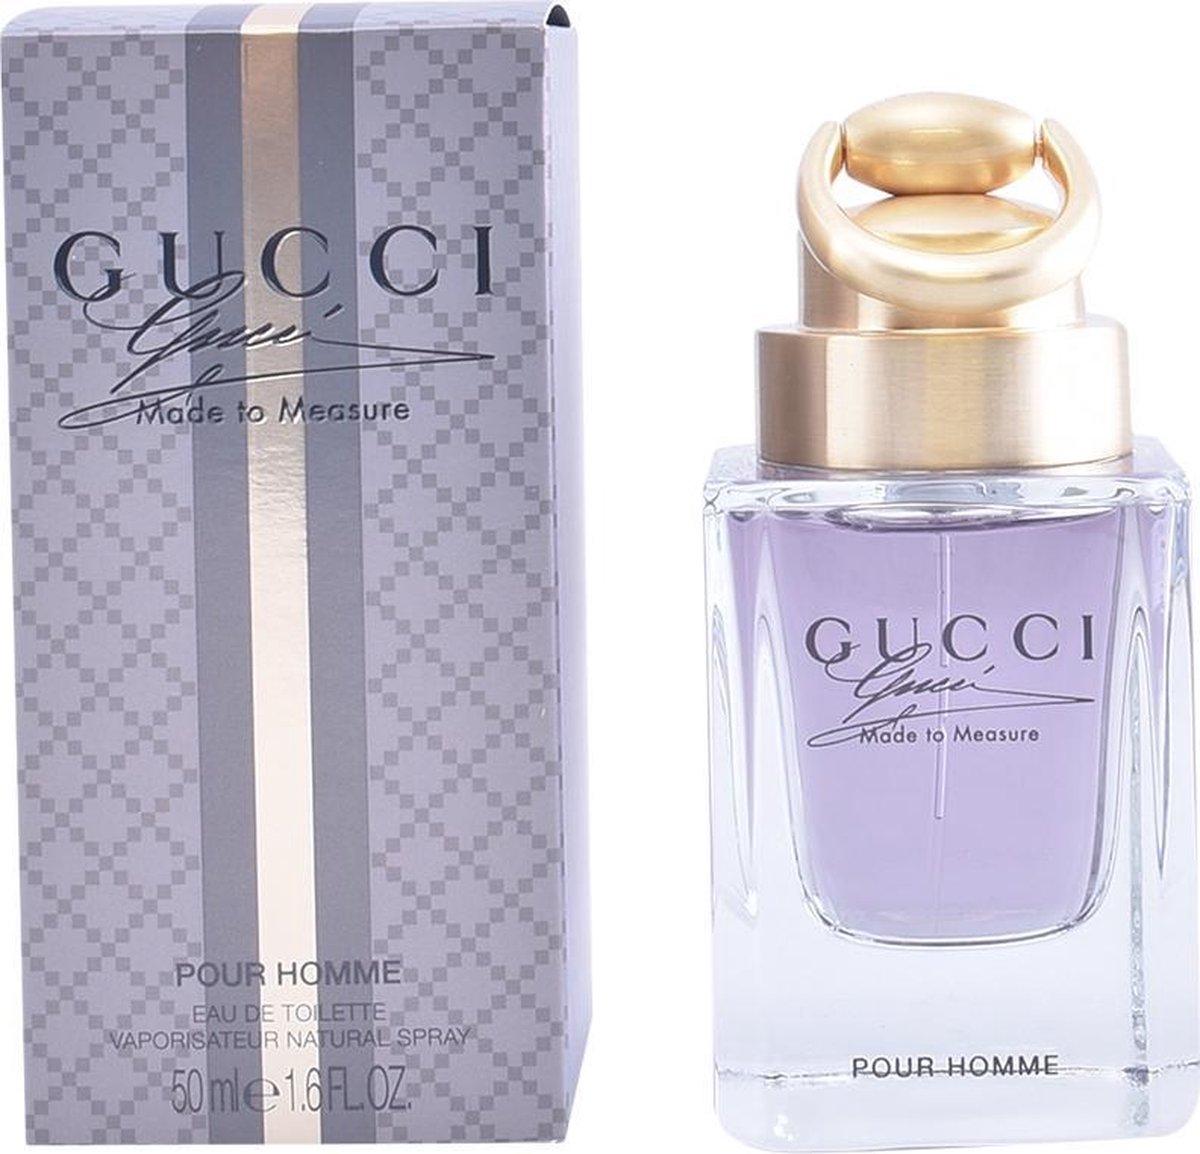 Gucci Made To Measure 50 ml - Eau de toilette - for Men - Gucci